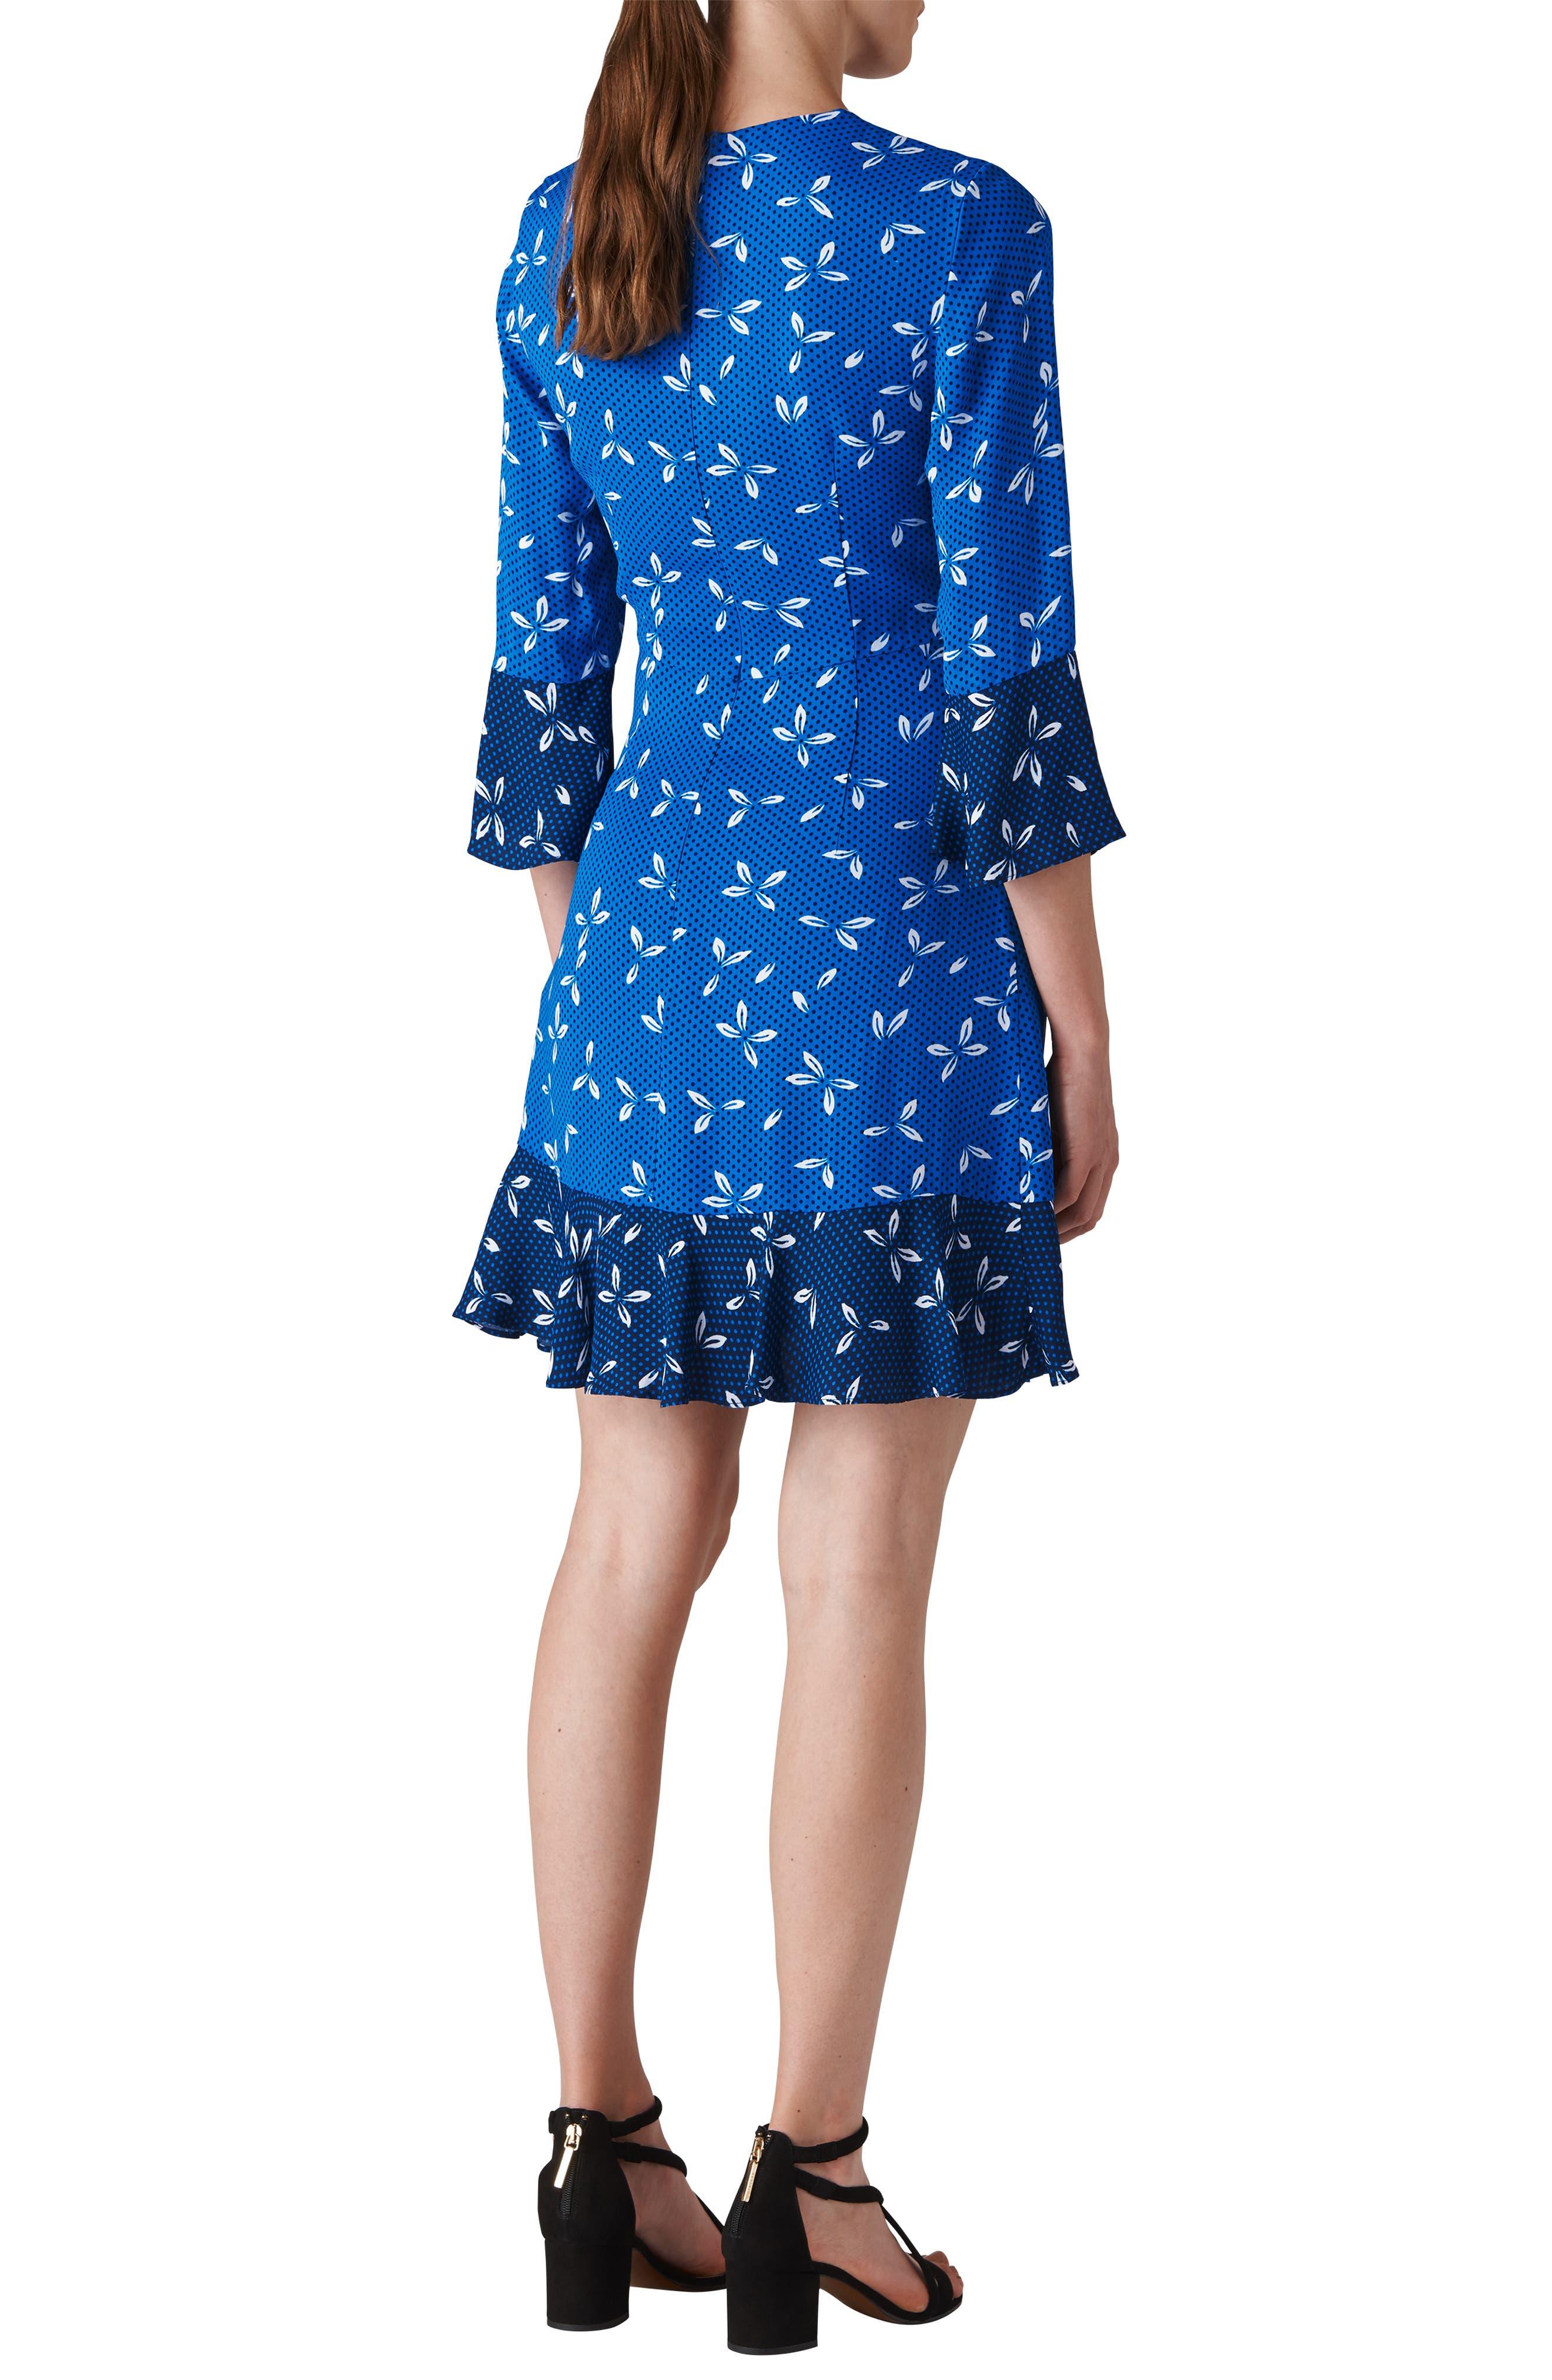 Polly Spot Print Dress,                             Alternate thumbnail 2, color,                             BLUE/ MULTI